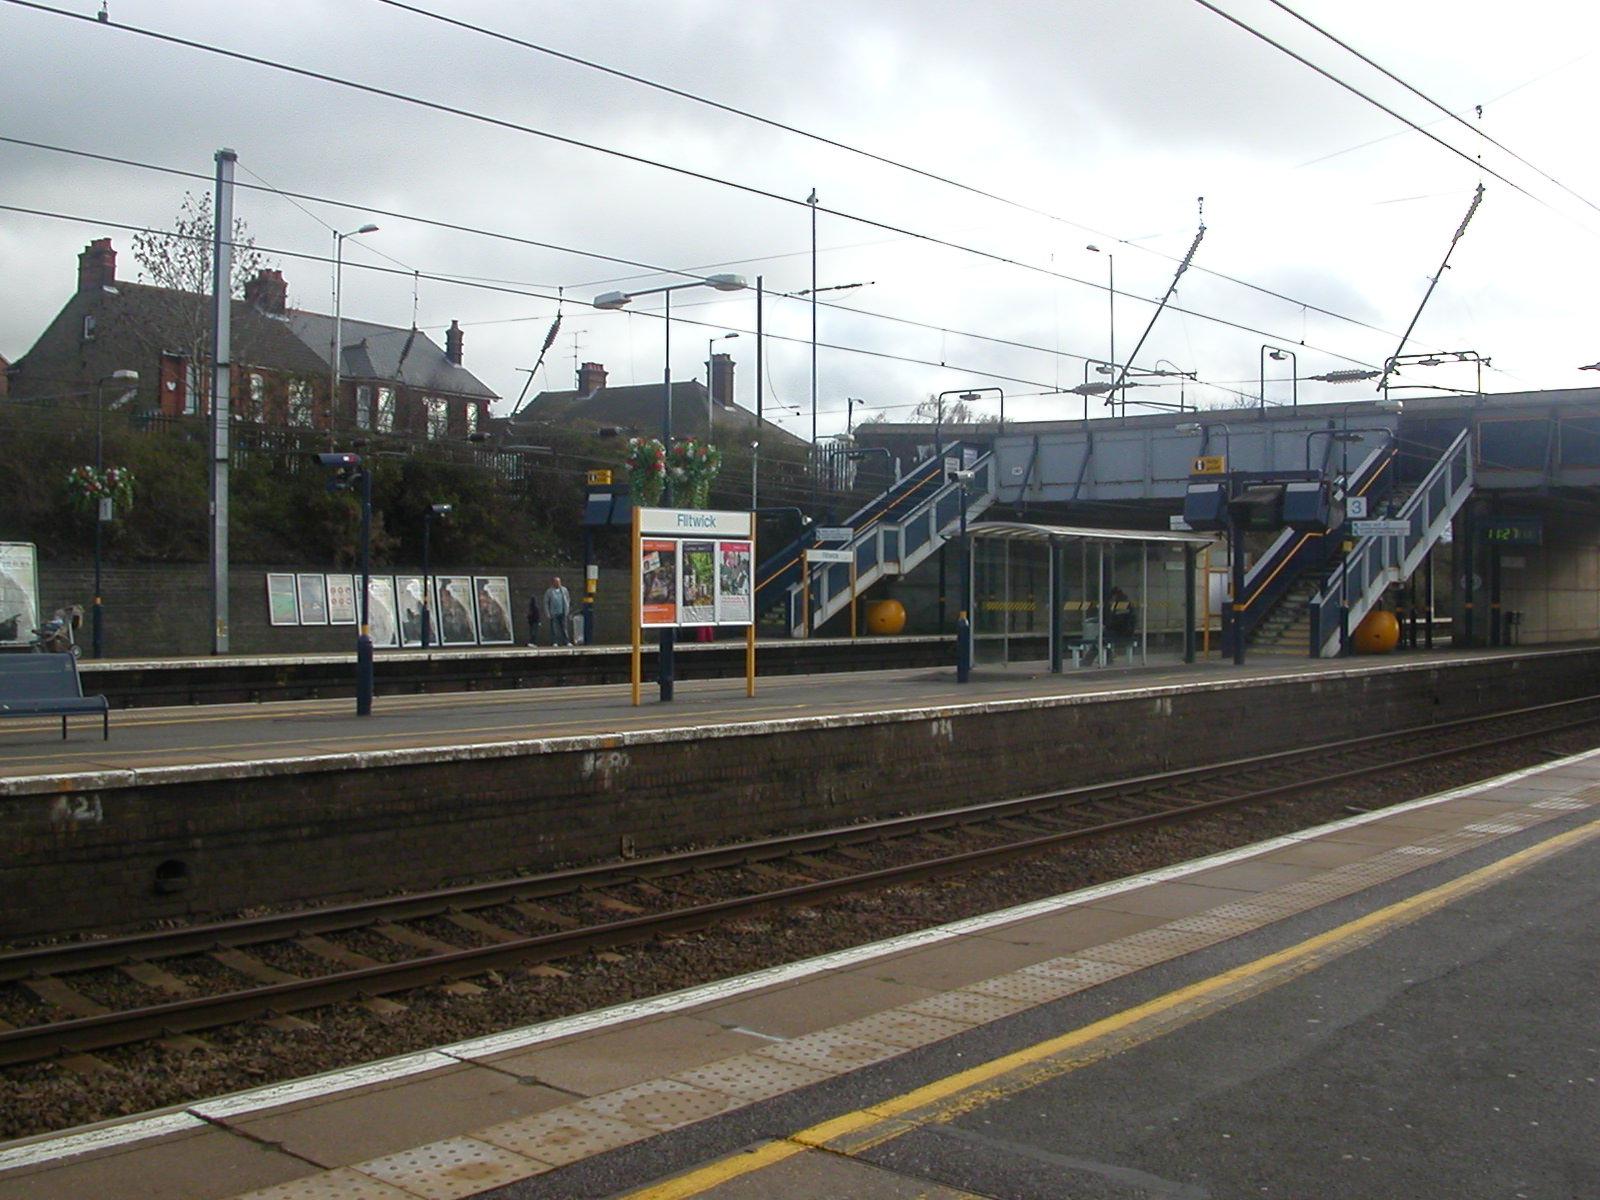 Flitwick Train Station